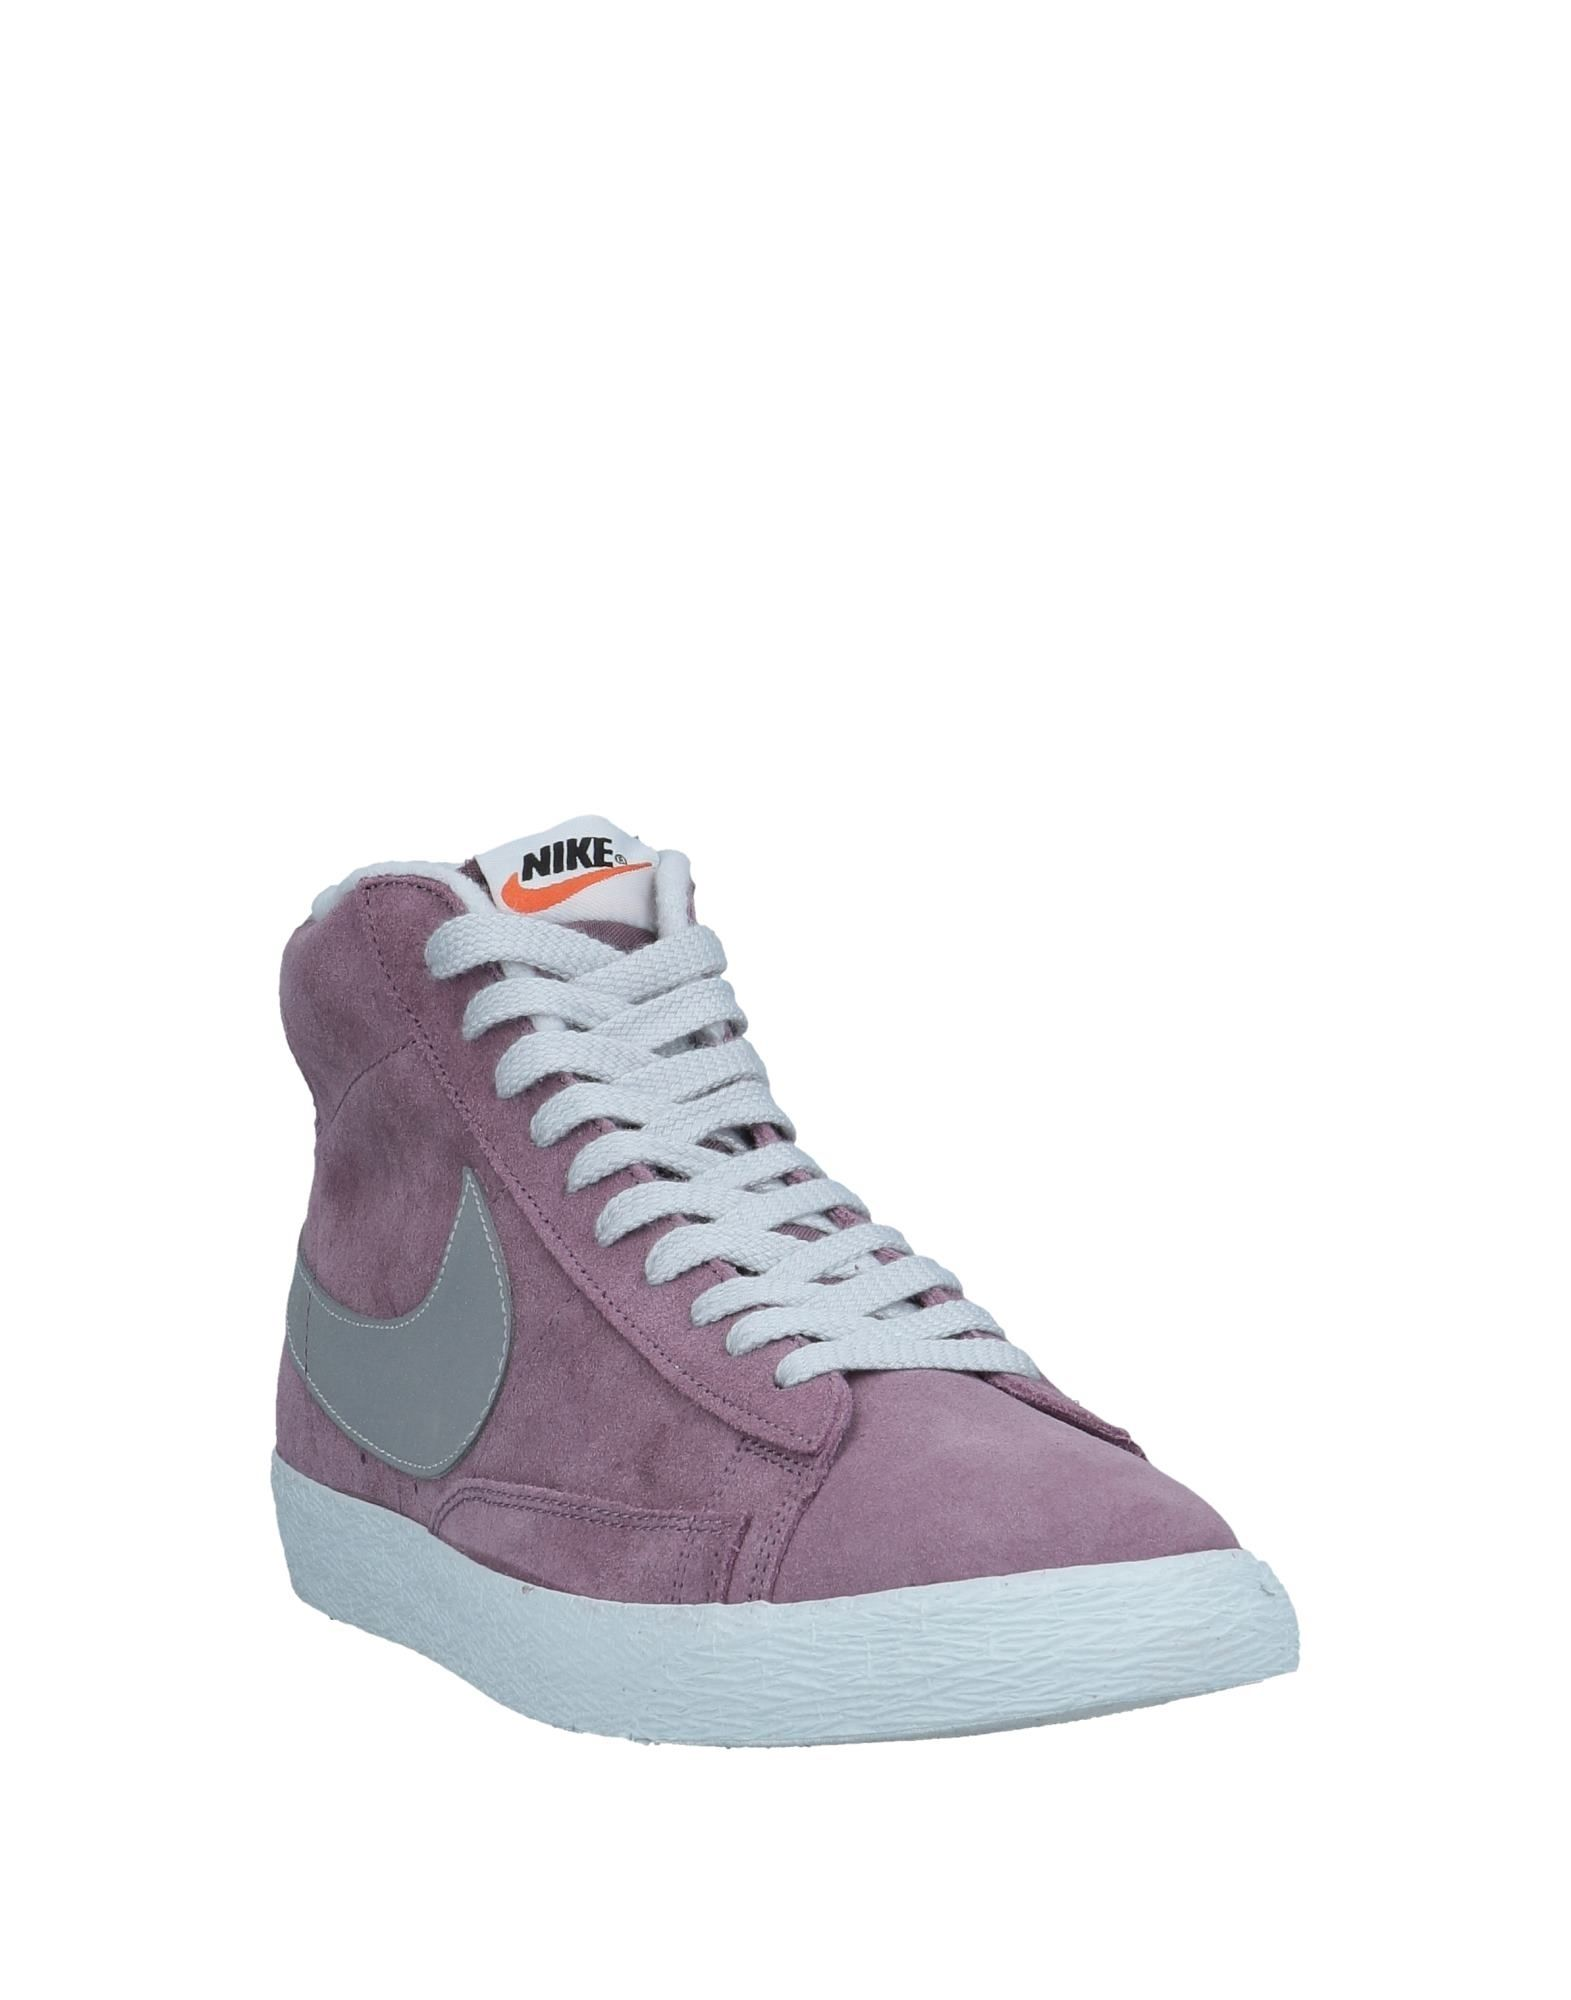 Nike Sneakers  - Men Nike Sneakers online on  Sneakers Canada - 11549301VO 2d5a15